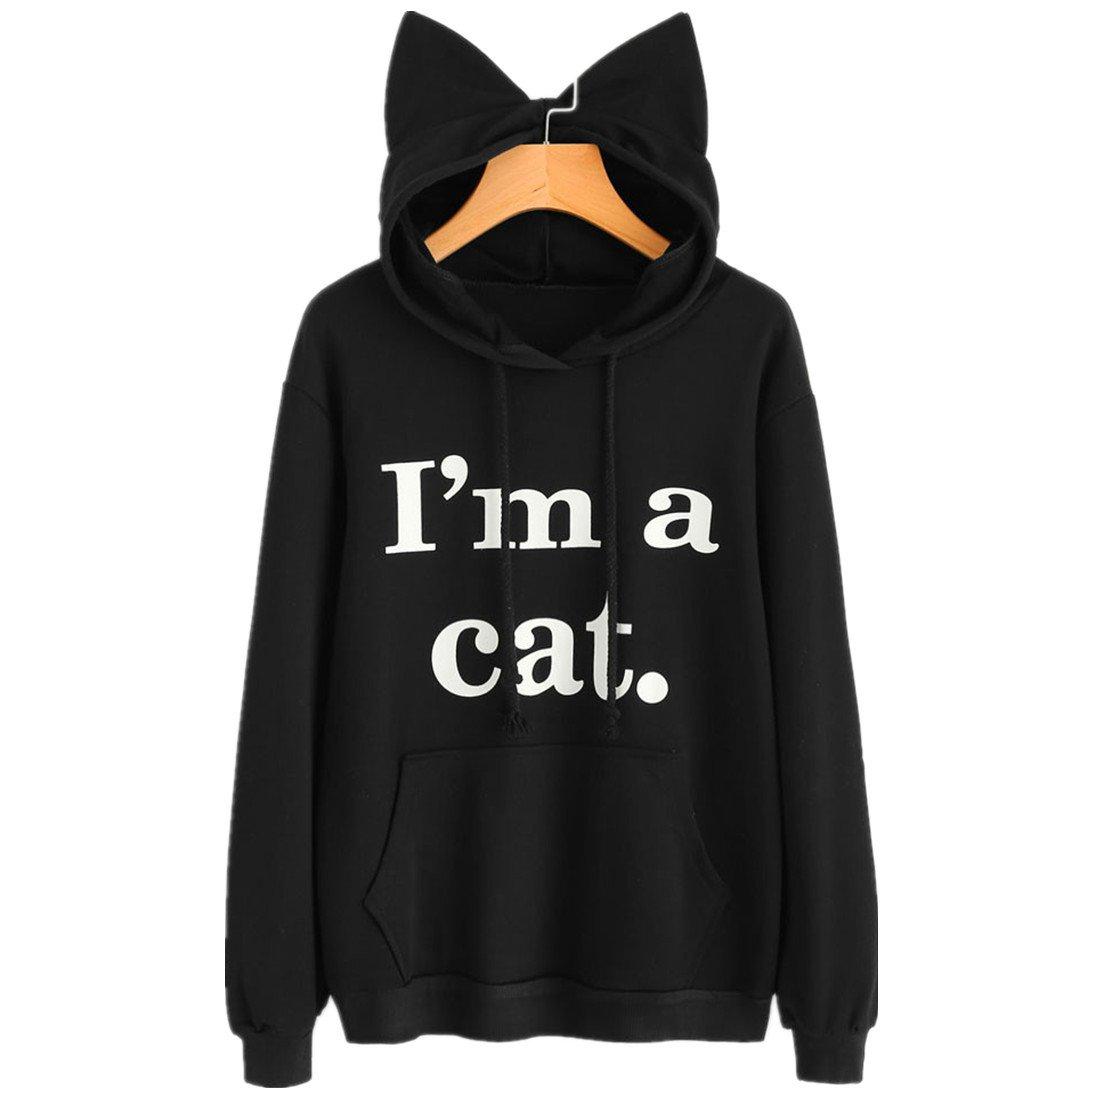 Qisc Women's Cute Cat Ear Big Pocket Hoody Sweatshirt, Cartoon Anime Kangaroo Pouch Carriers Hoodie Pullover (XL, Black)